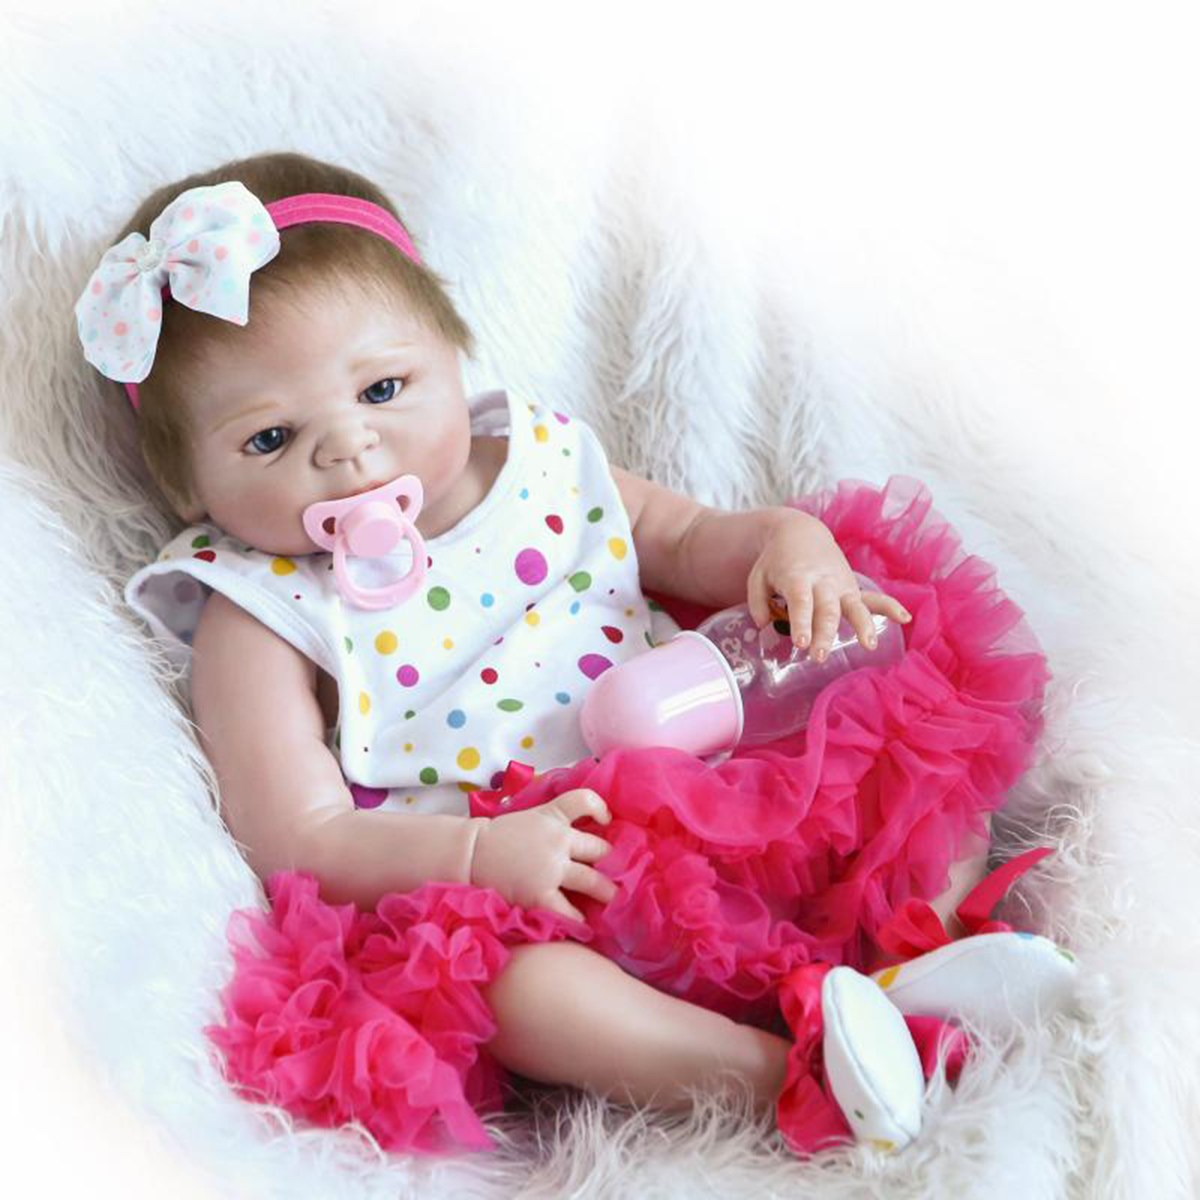 22inch Reborn Baby Doll Handmade Lifelike Newborn Girl Doll Play House Toys Grooming Healthcare Kits кукла 44271926101 usa berenguer reborn baby doll